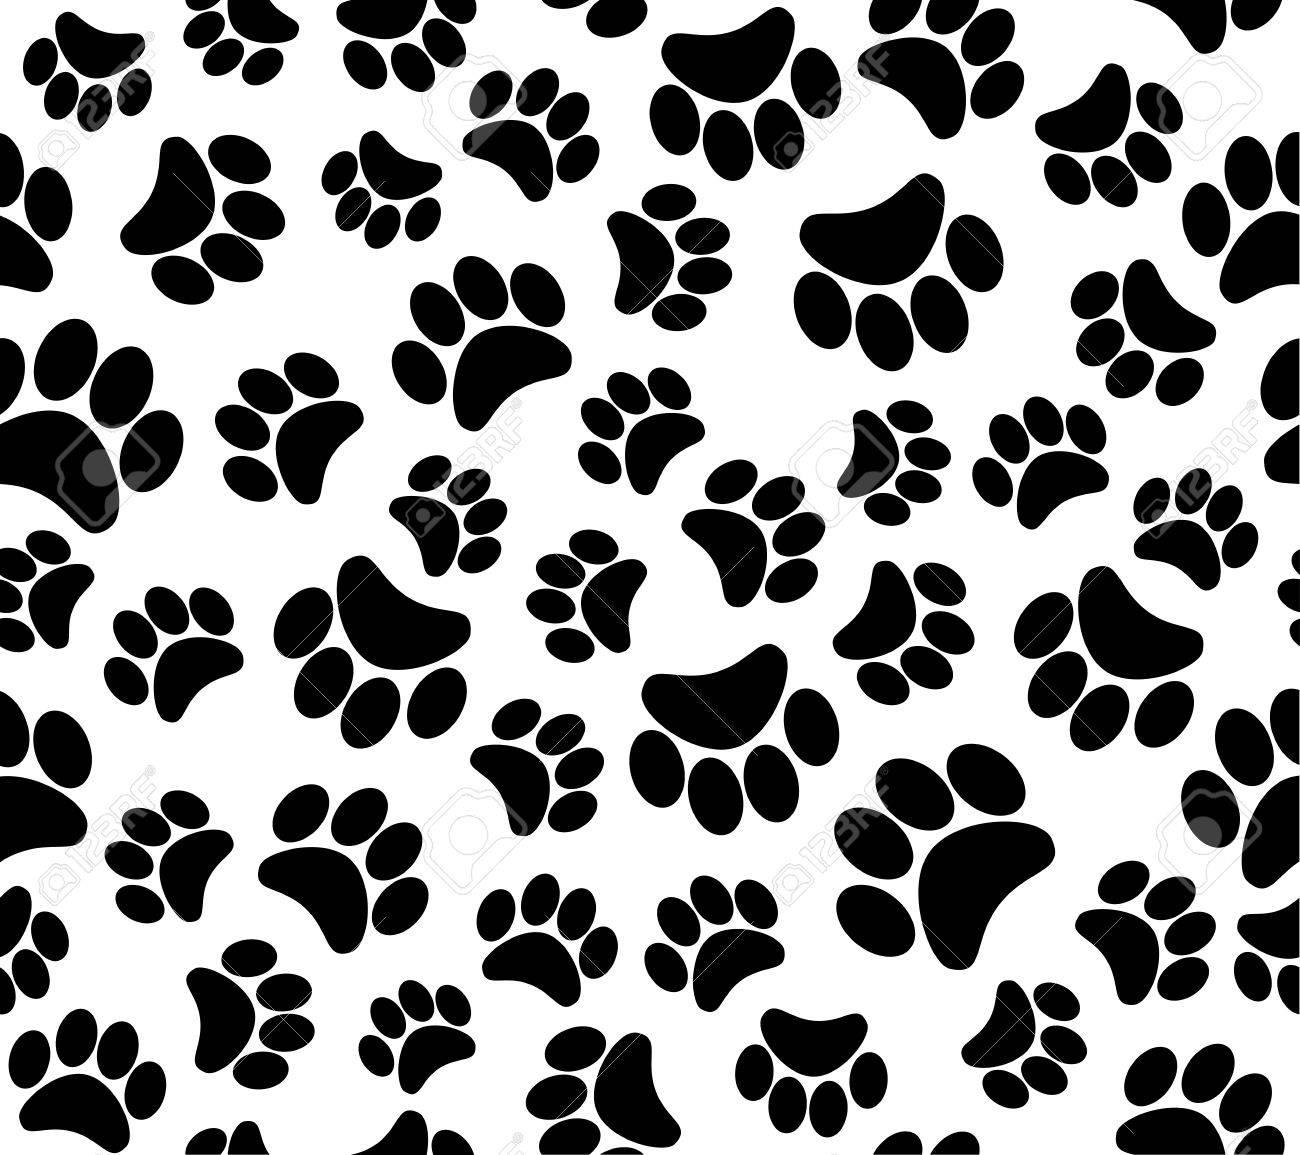 background animal footprints seamless pattern - 31024397